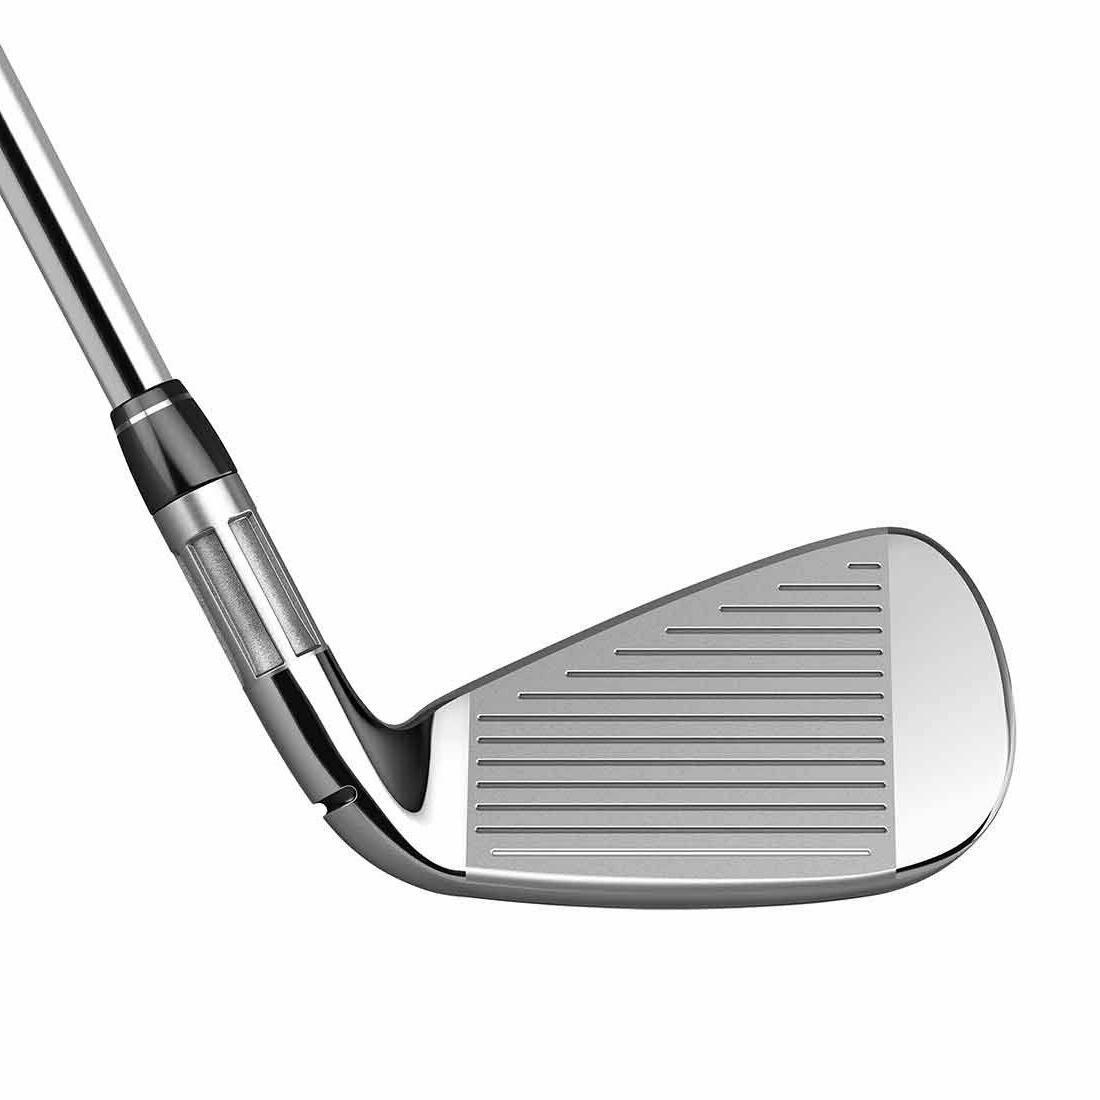 NEW TaylorMade Golf Single Shaft, Flex,